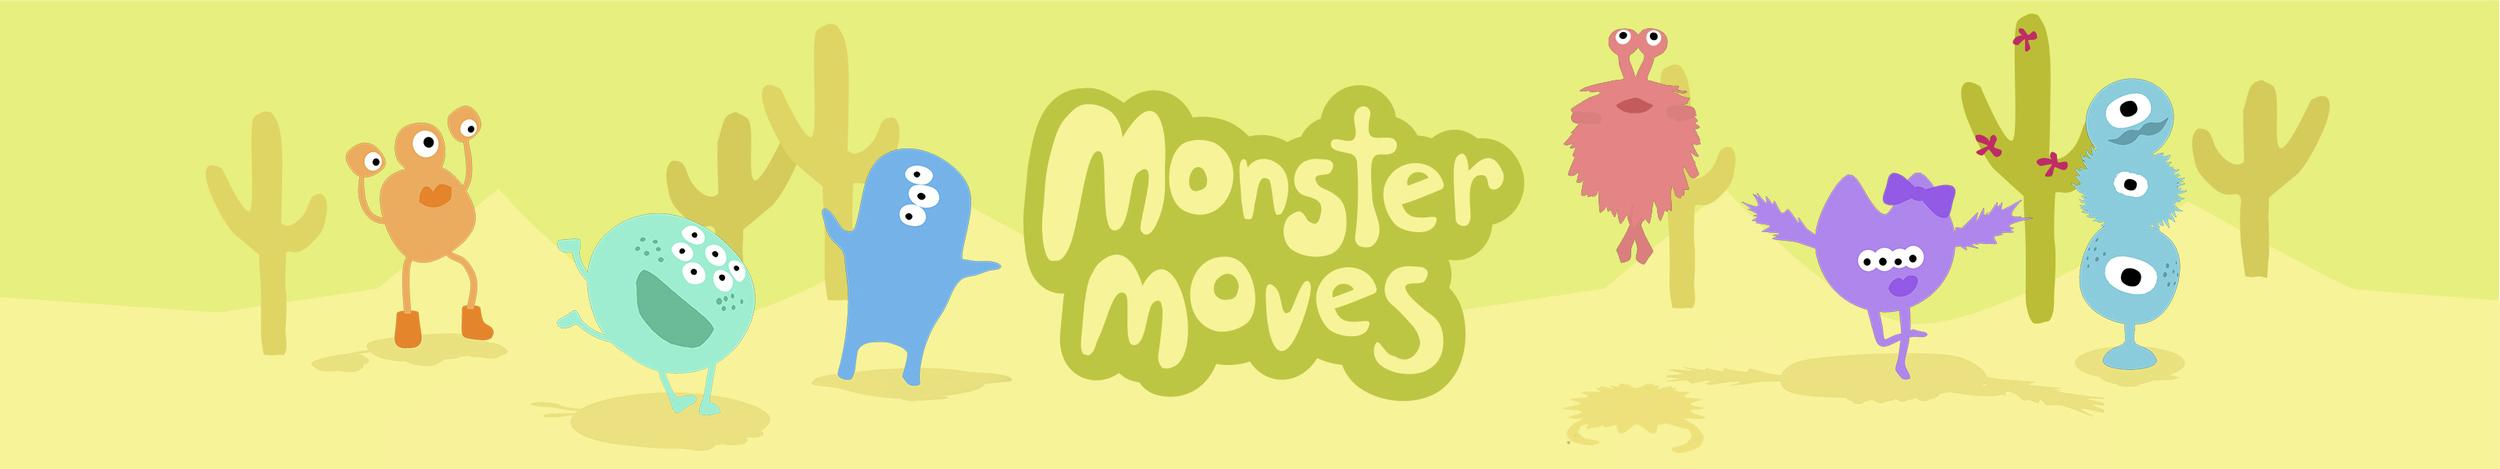 MonsterMoves.jpg